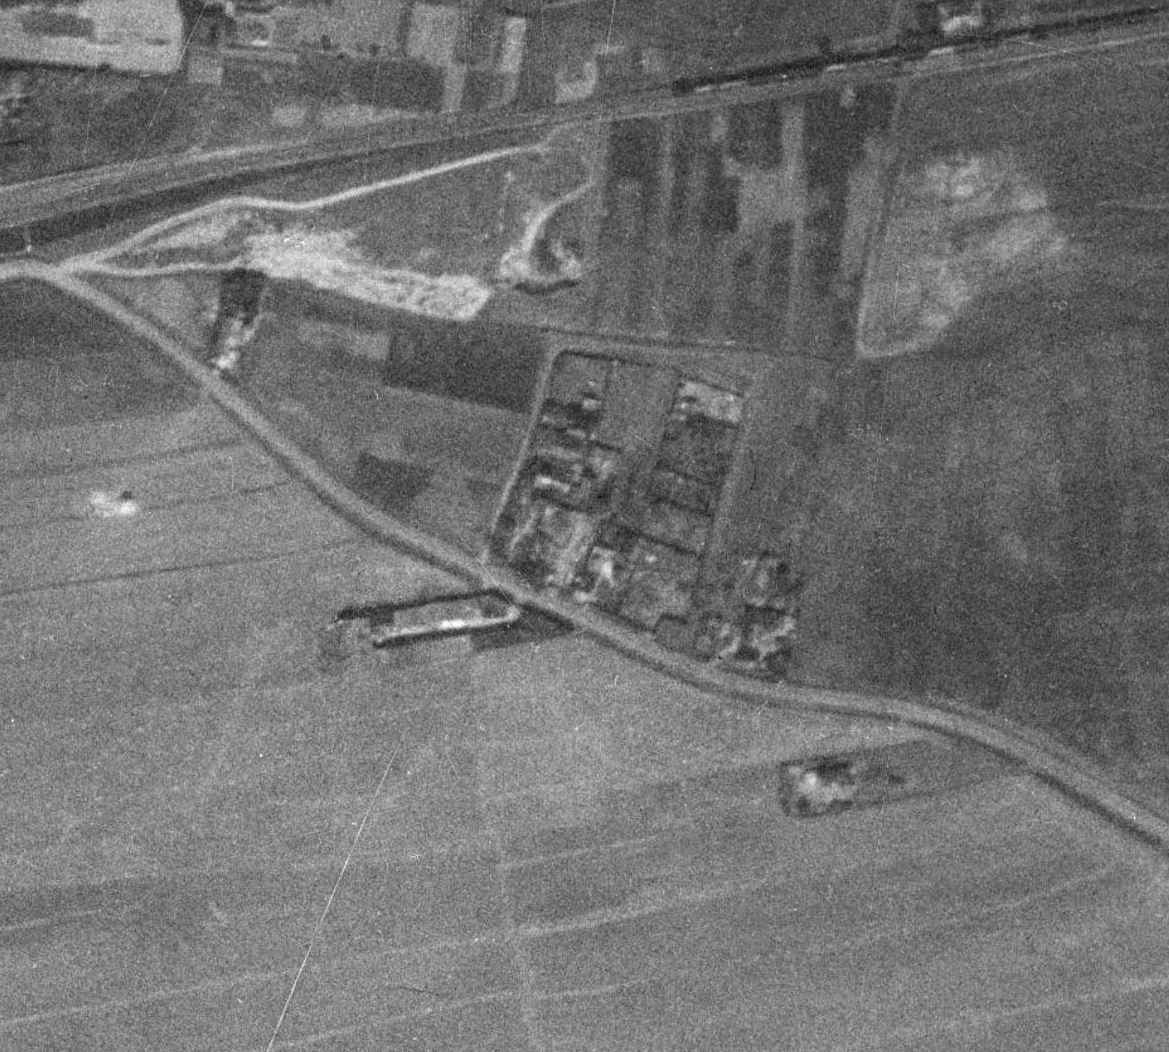 nouzova-kolonie-k-vackovu-letecky-snimek-1953